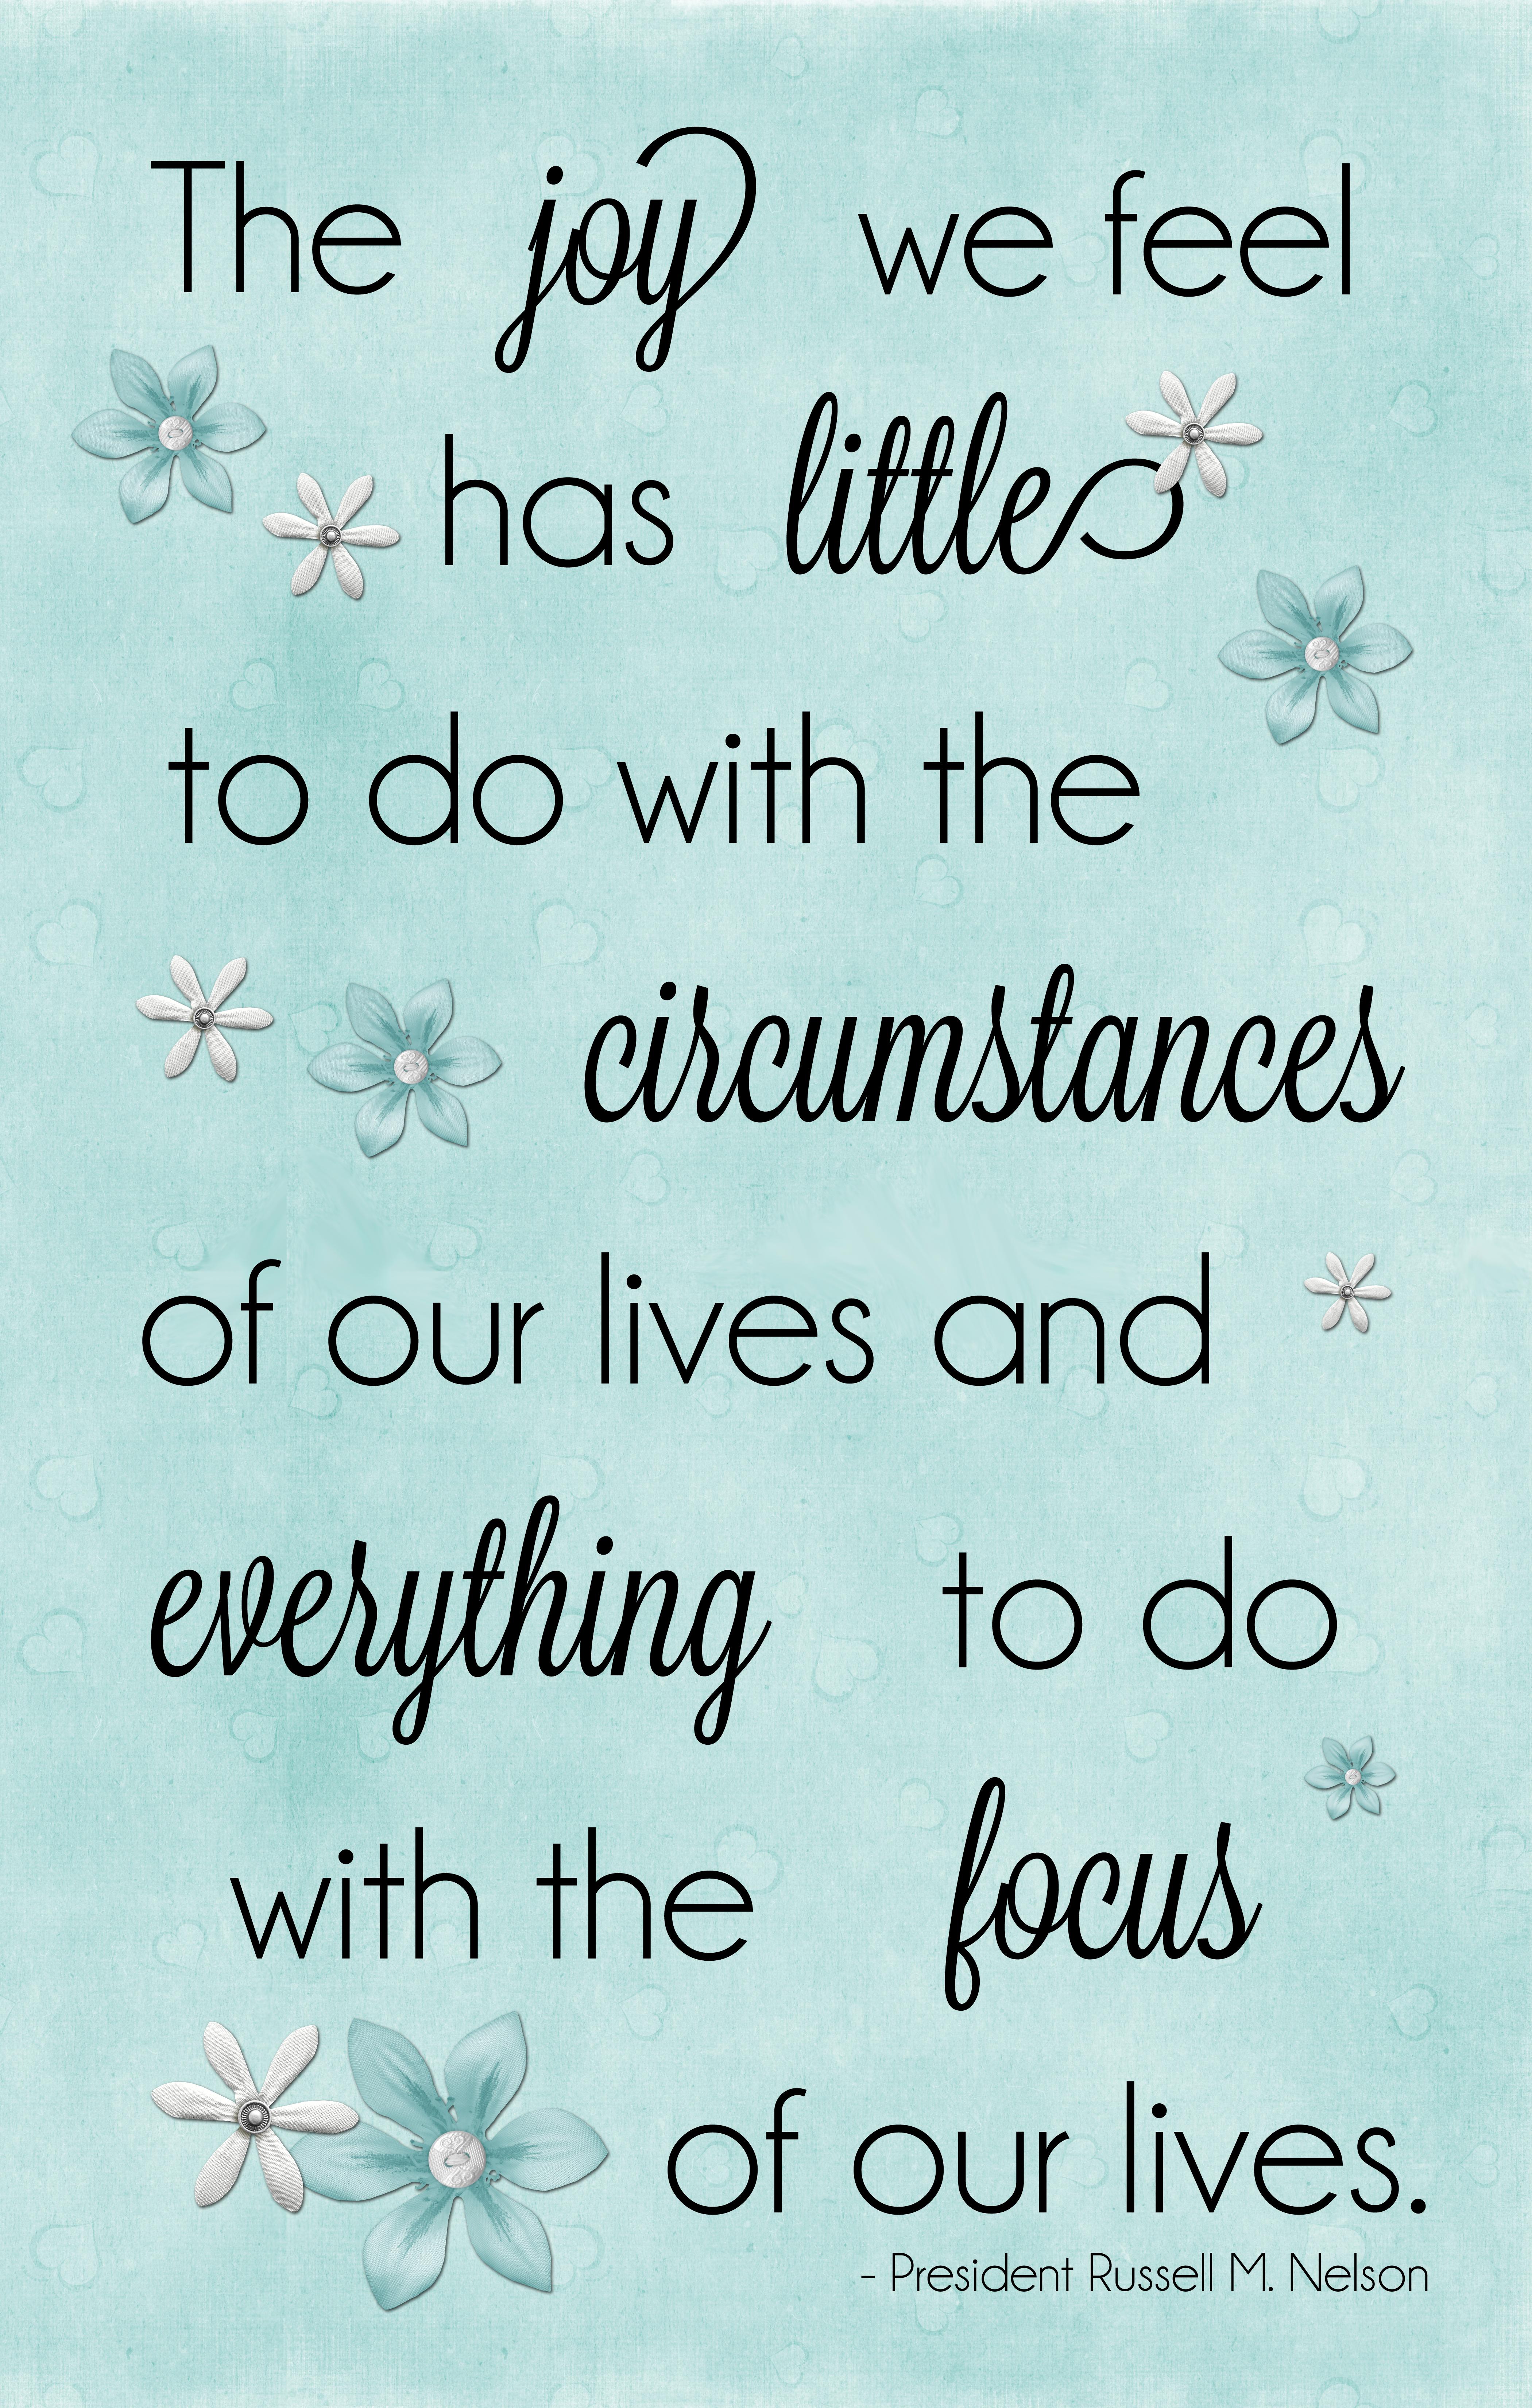 joy and focus